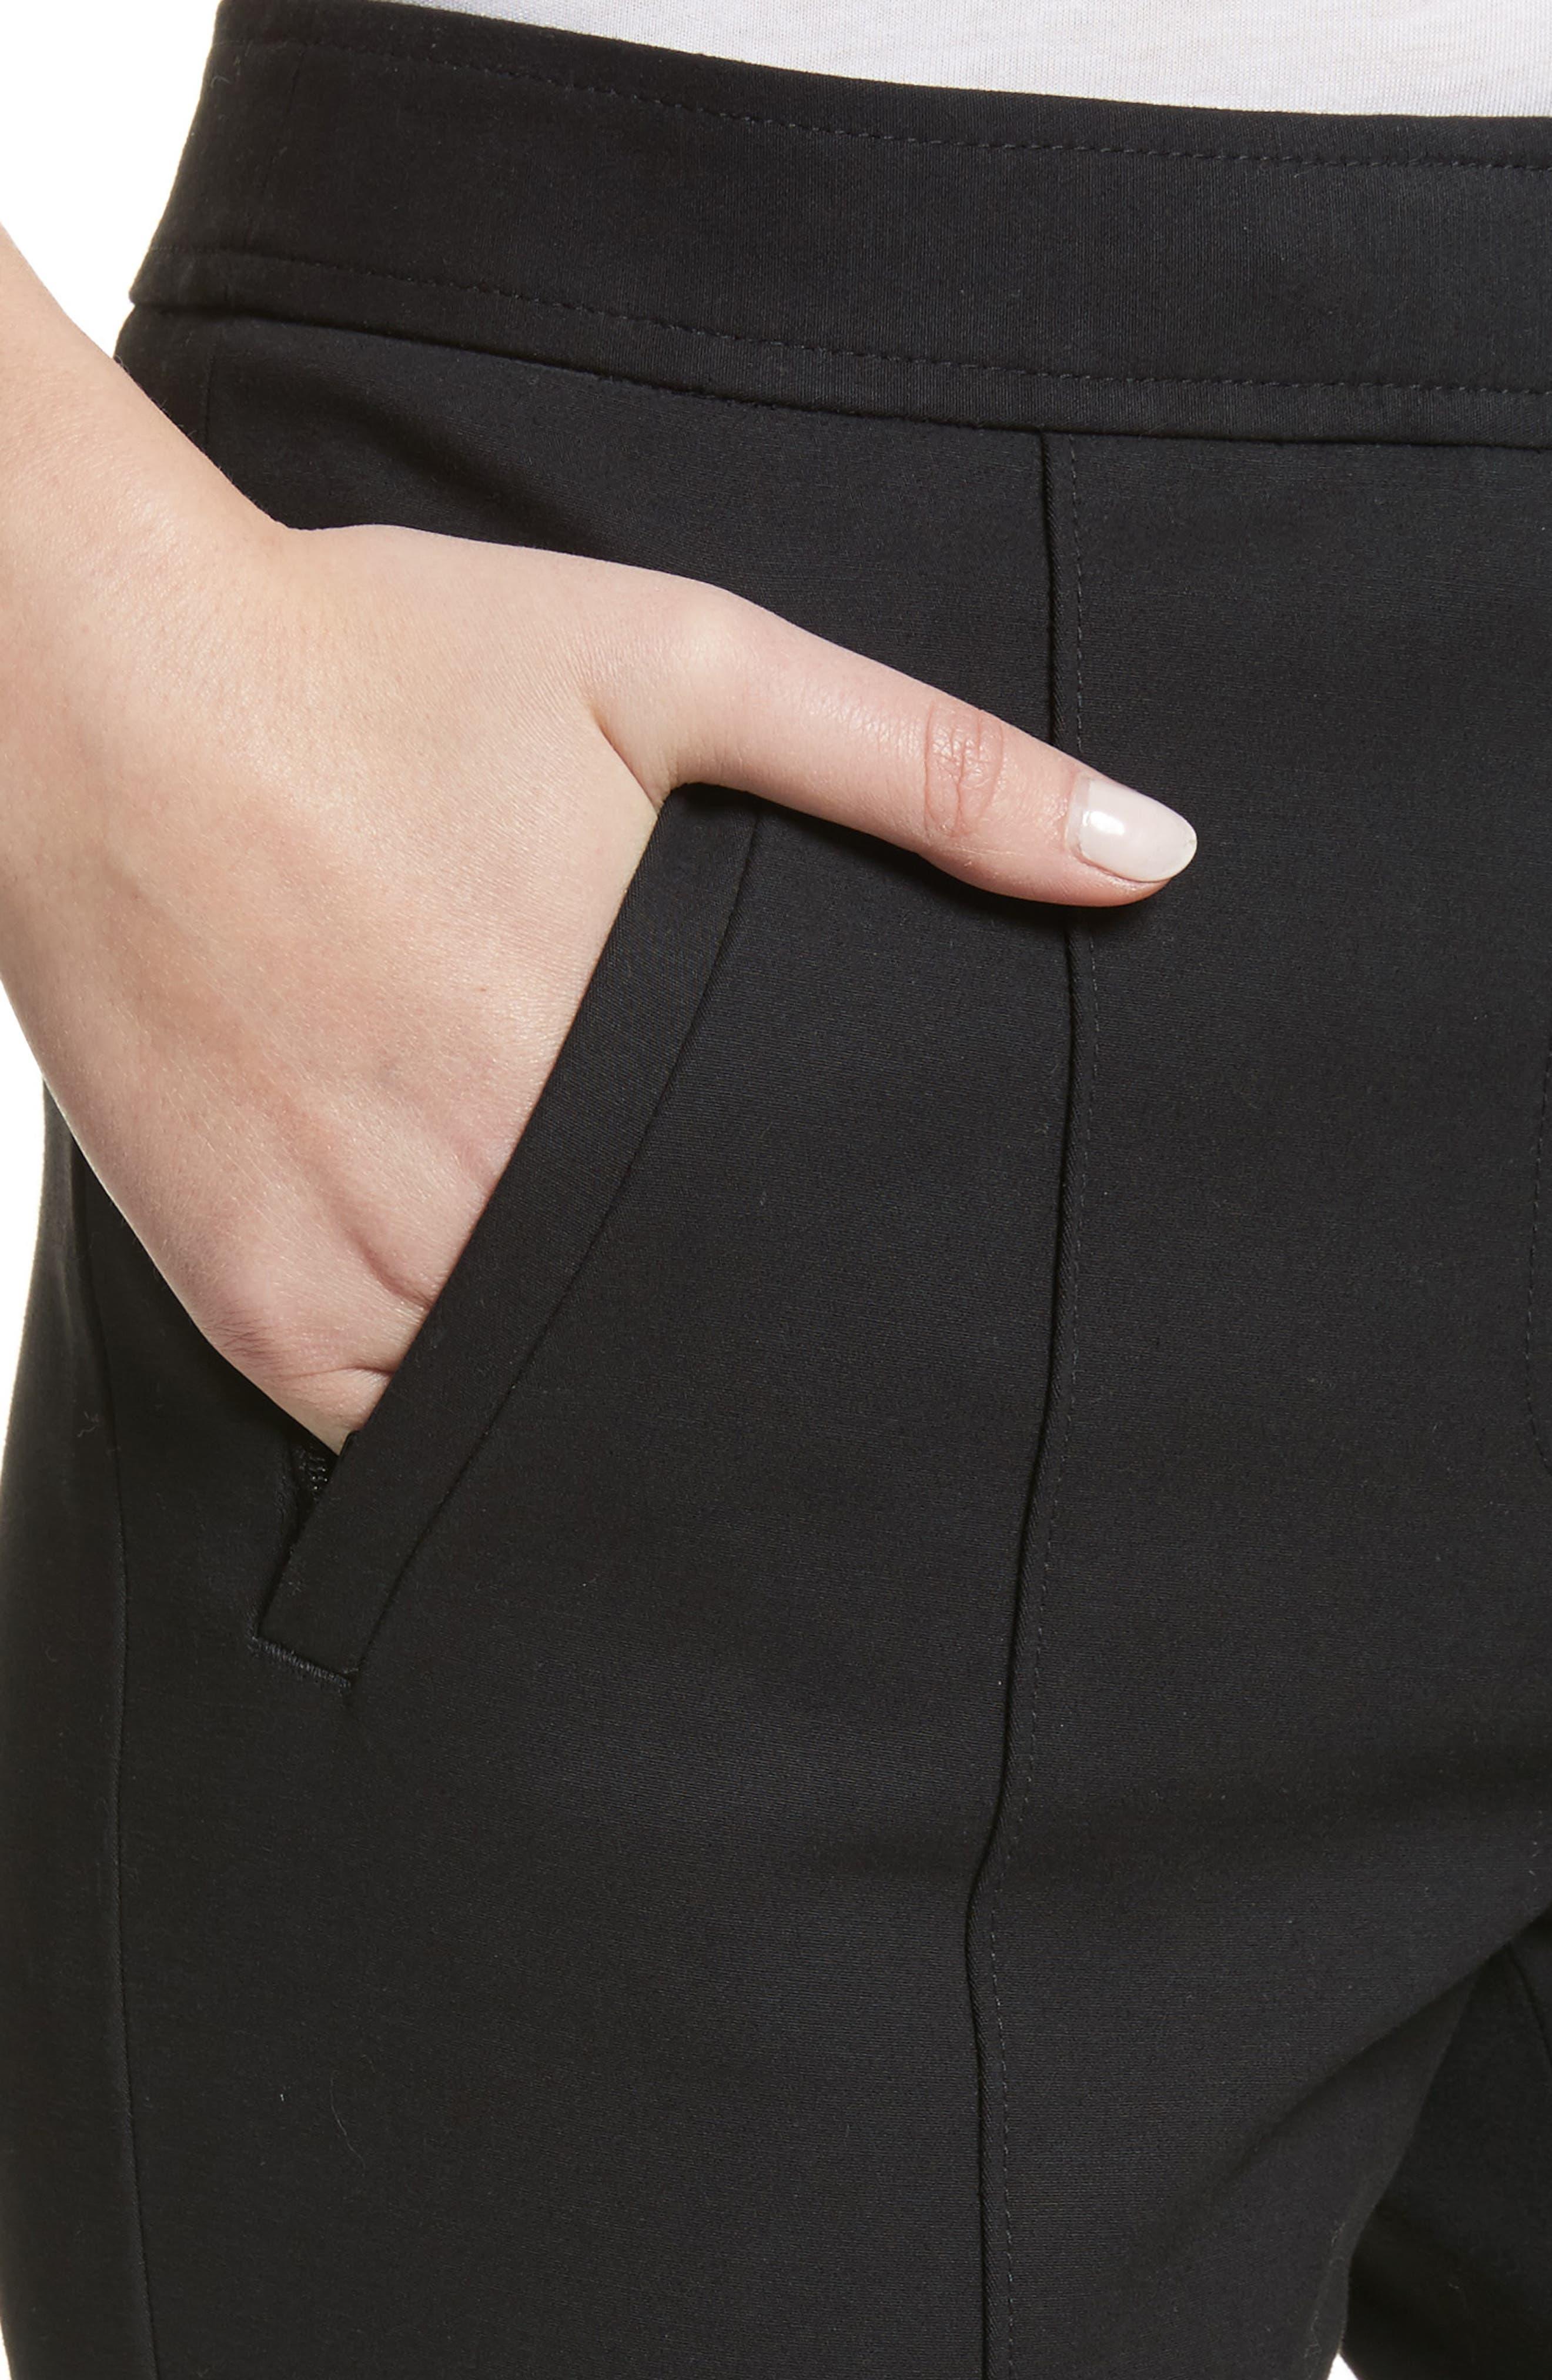 Vanner Slim Leg Ankle Pants,                             Alternate thumbnail 4, color,                             Black